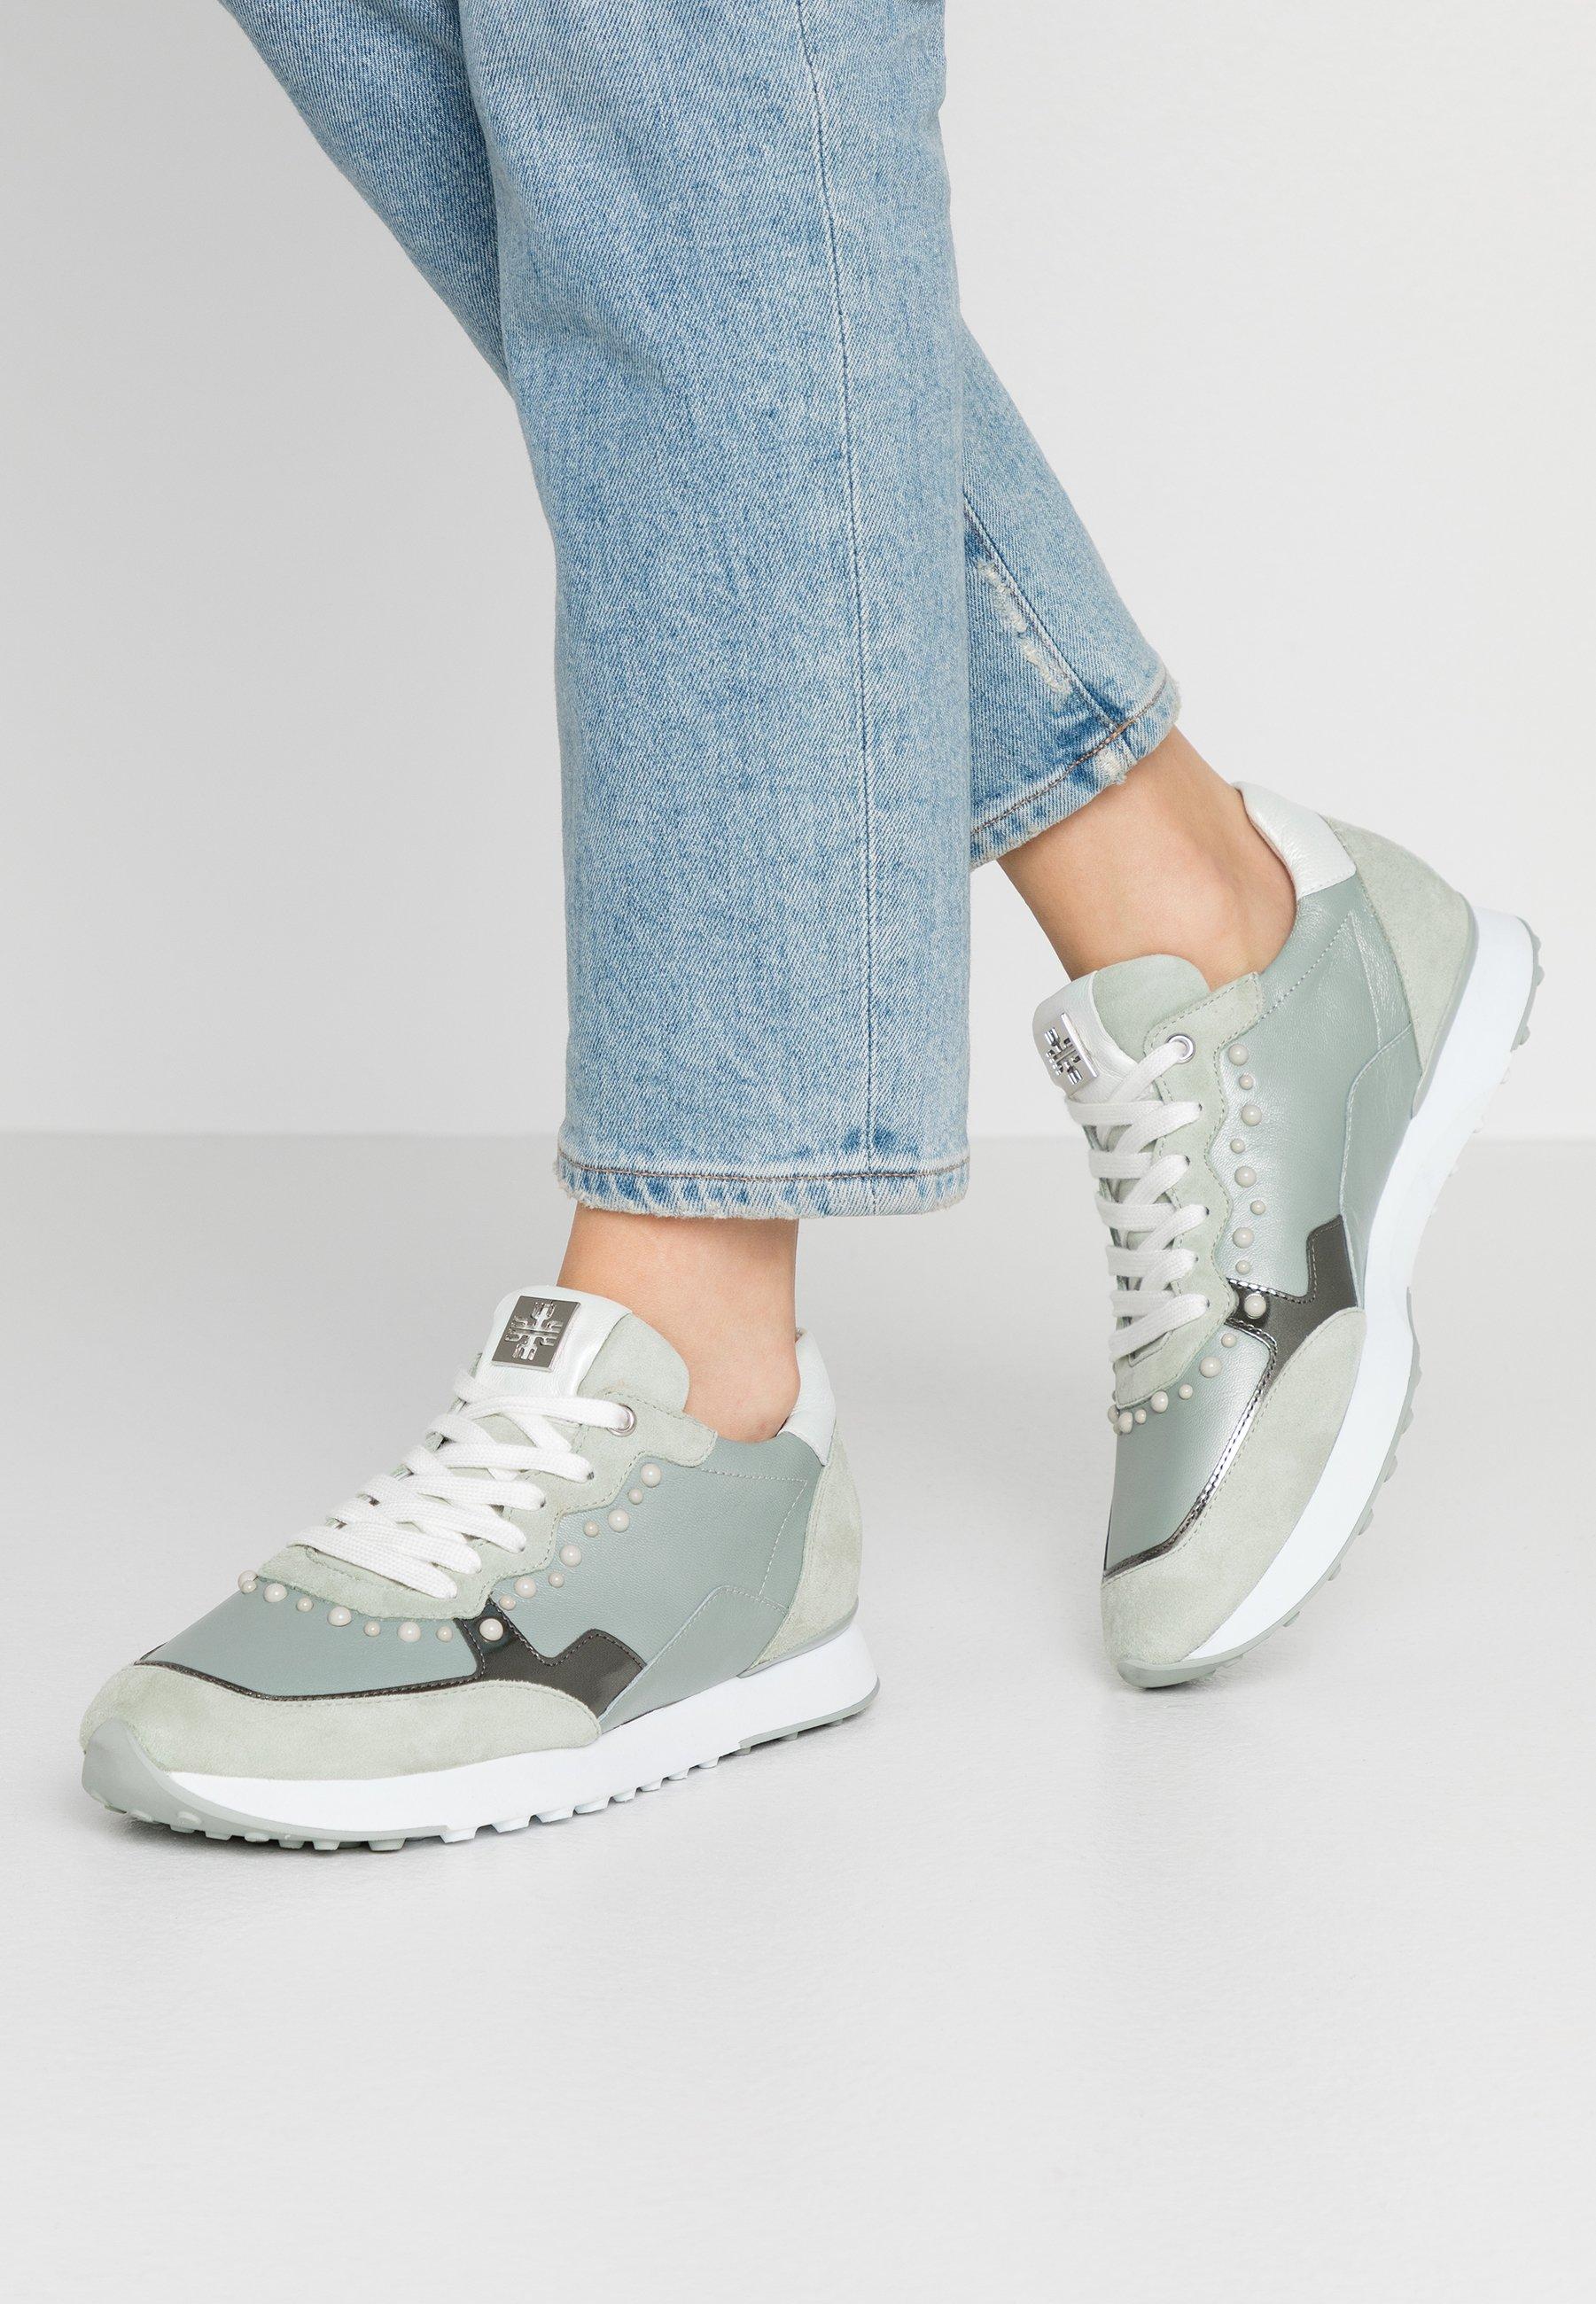 Gutes Angebot Högl Sneaker low - salvia | Damenbekleidung 2020